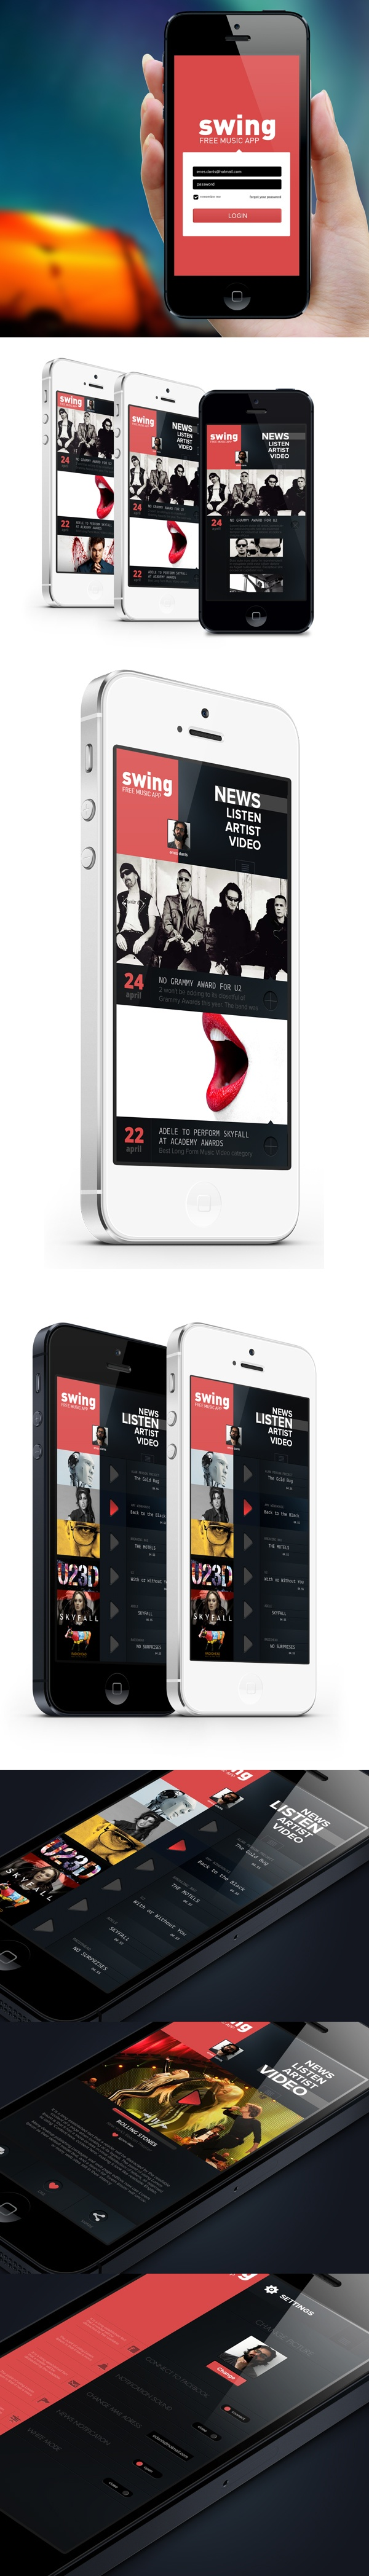 iphone Music App (concept) by Enes Danis, via Behance